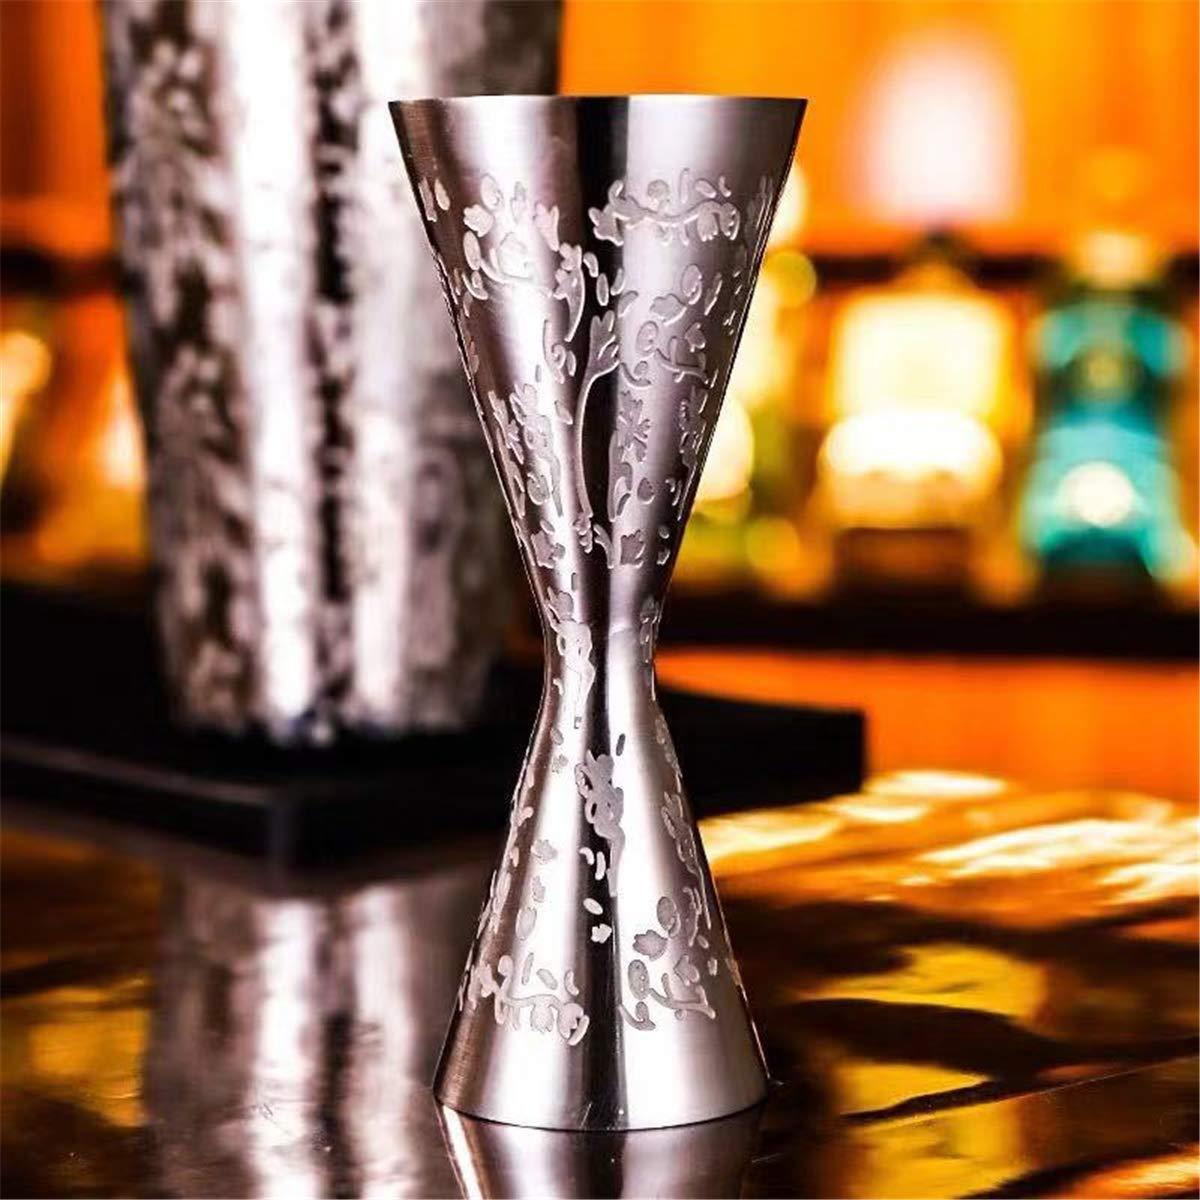 Black Boston Cocktail Shaker Set for Professional Bartender and Home Bar Including 18oz /& 28oz Tins Shaker Muddler Strainer 9 Piece Mixing Spoon and Cocktail Pourer Measuring Jigger